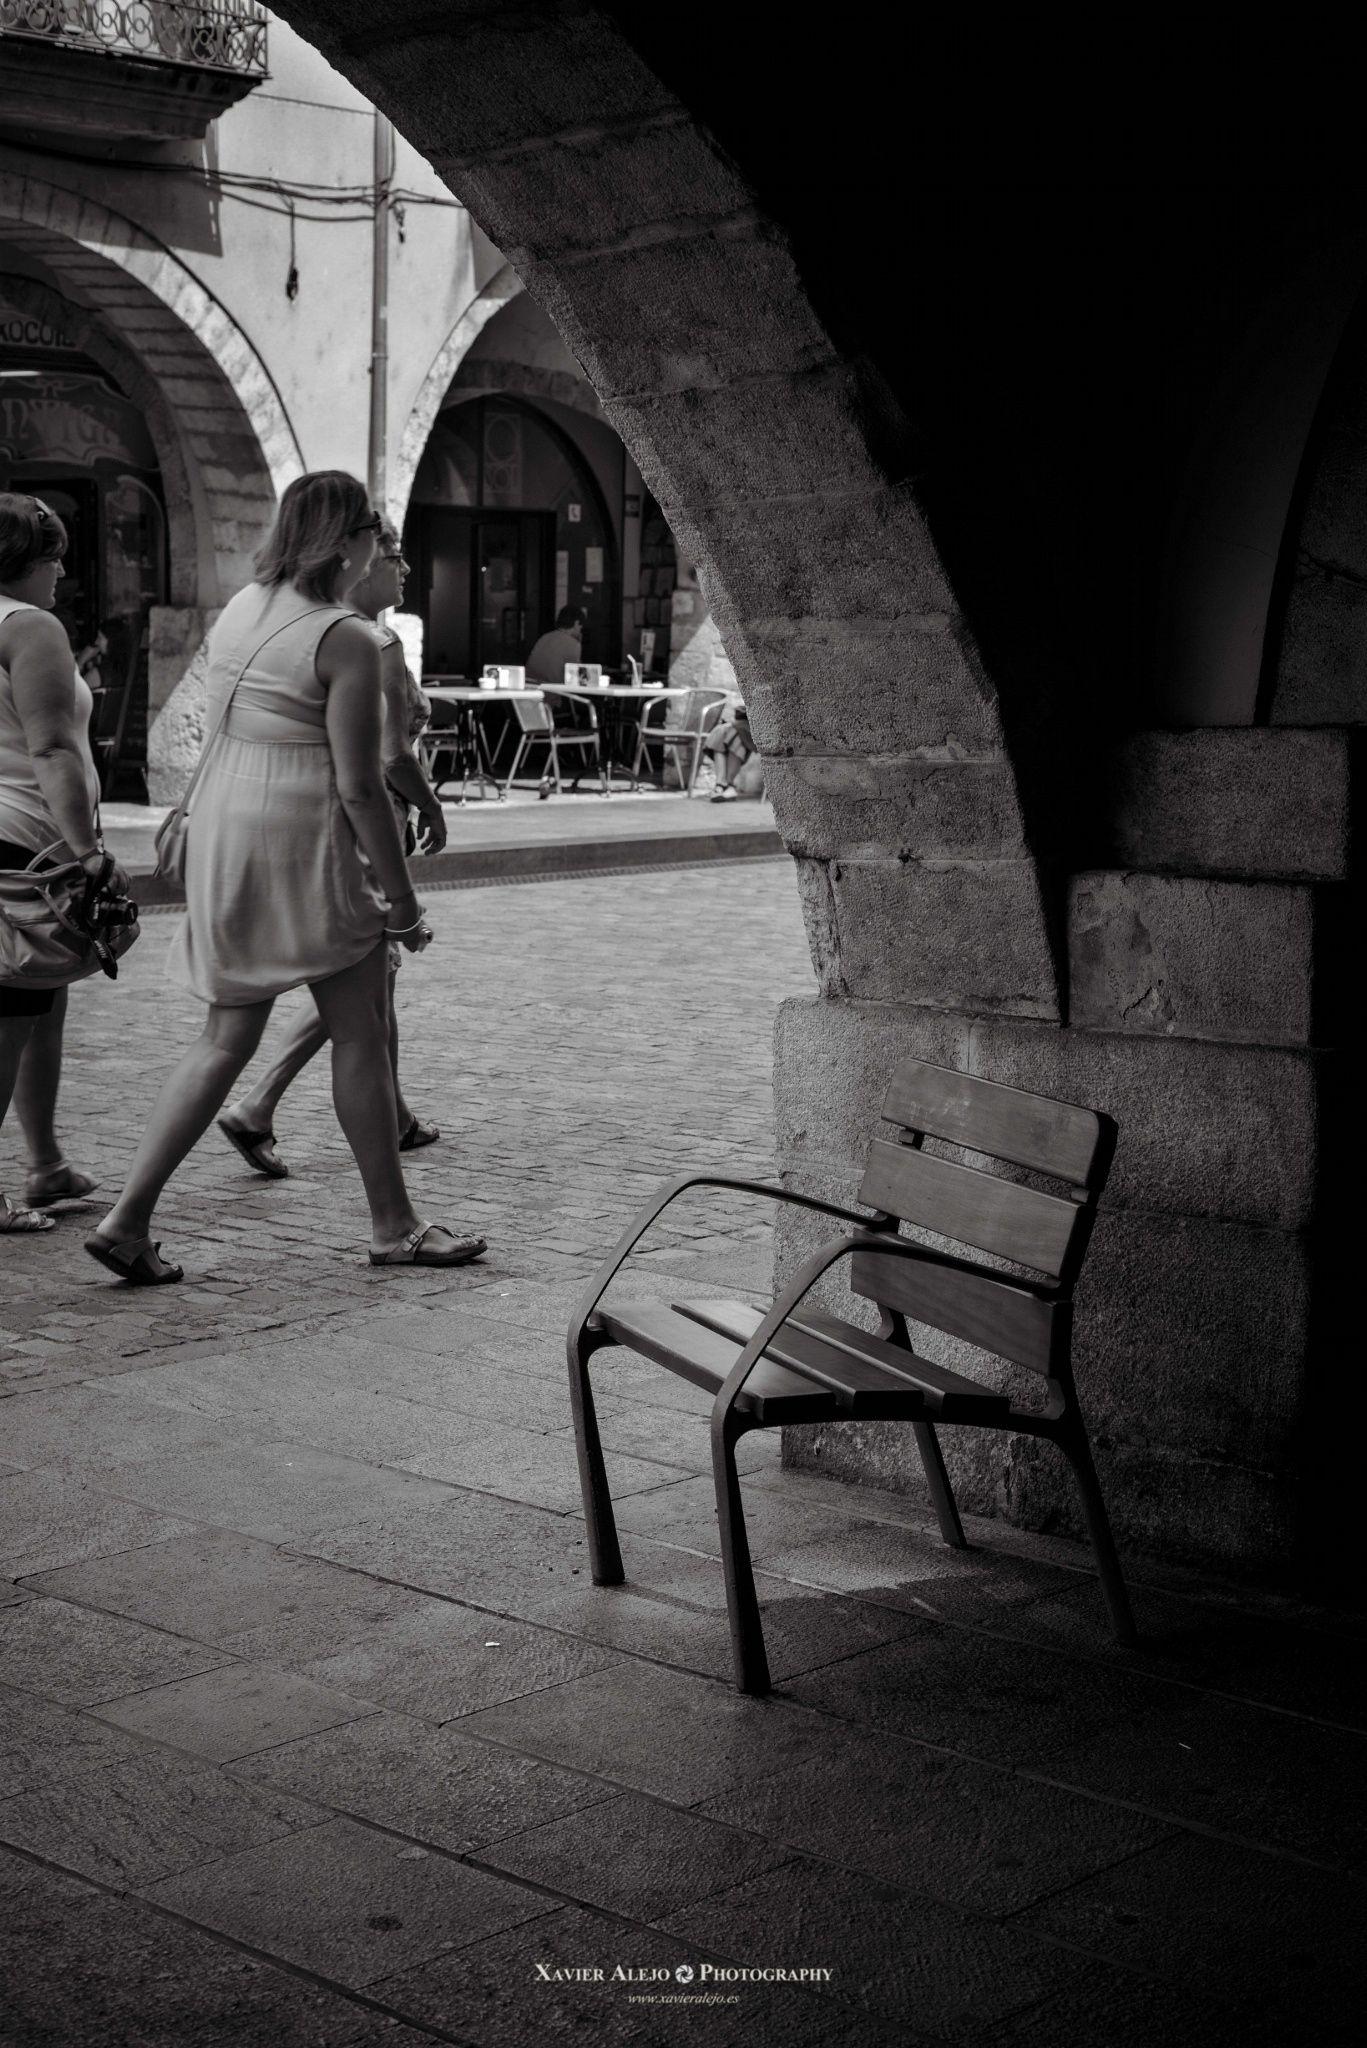 El Banc - Girona, 07/08/2014